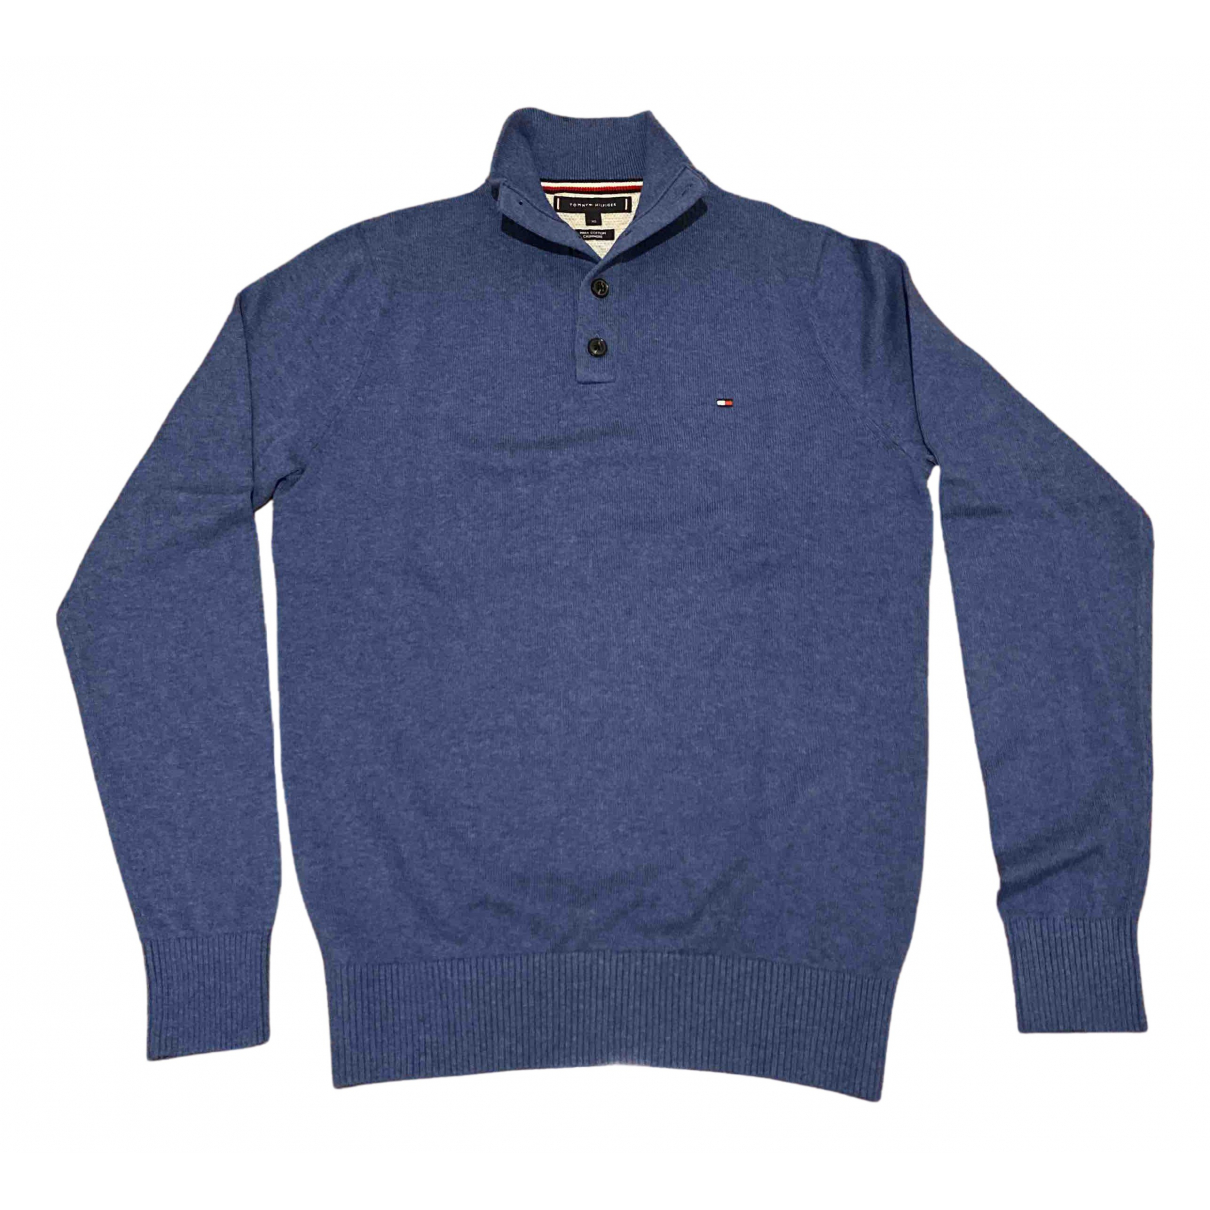 Tommy Hilfiger N Blue Cotton Knitwear & Sweatshirts for Men XS International